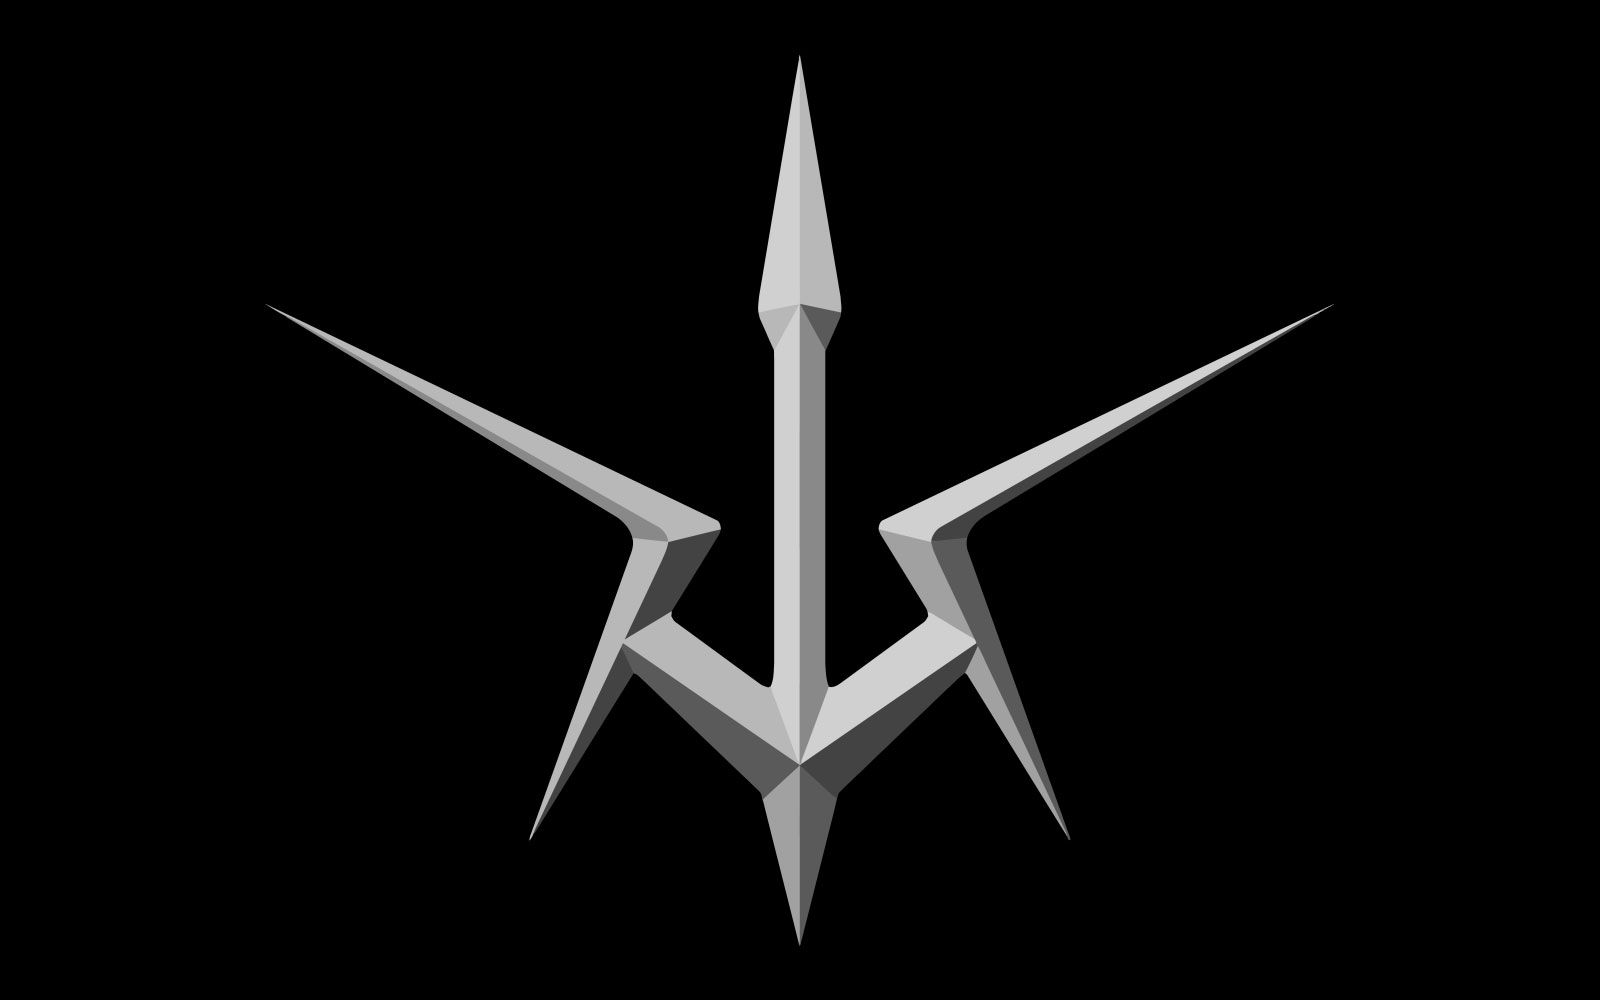 Symbol of the Black Knights | Code geass wallpaper, Code ...